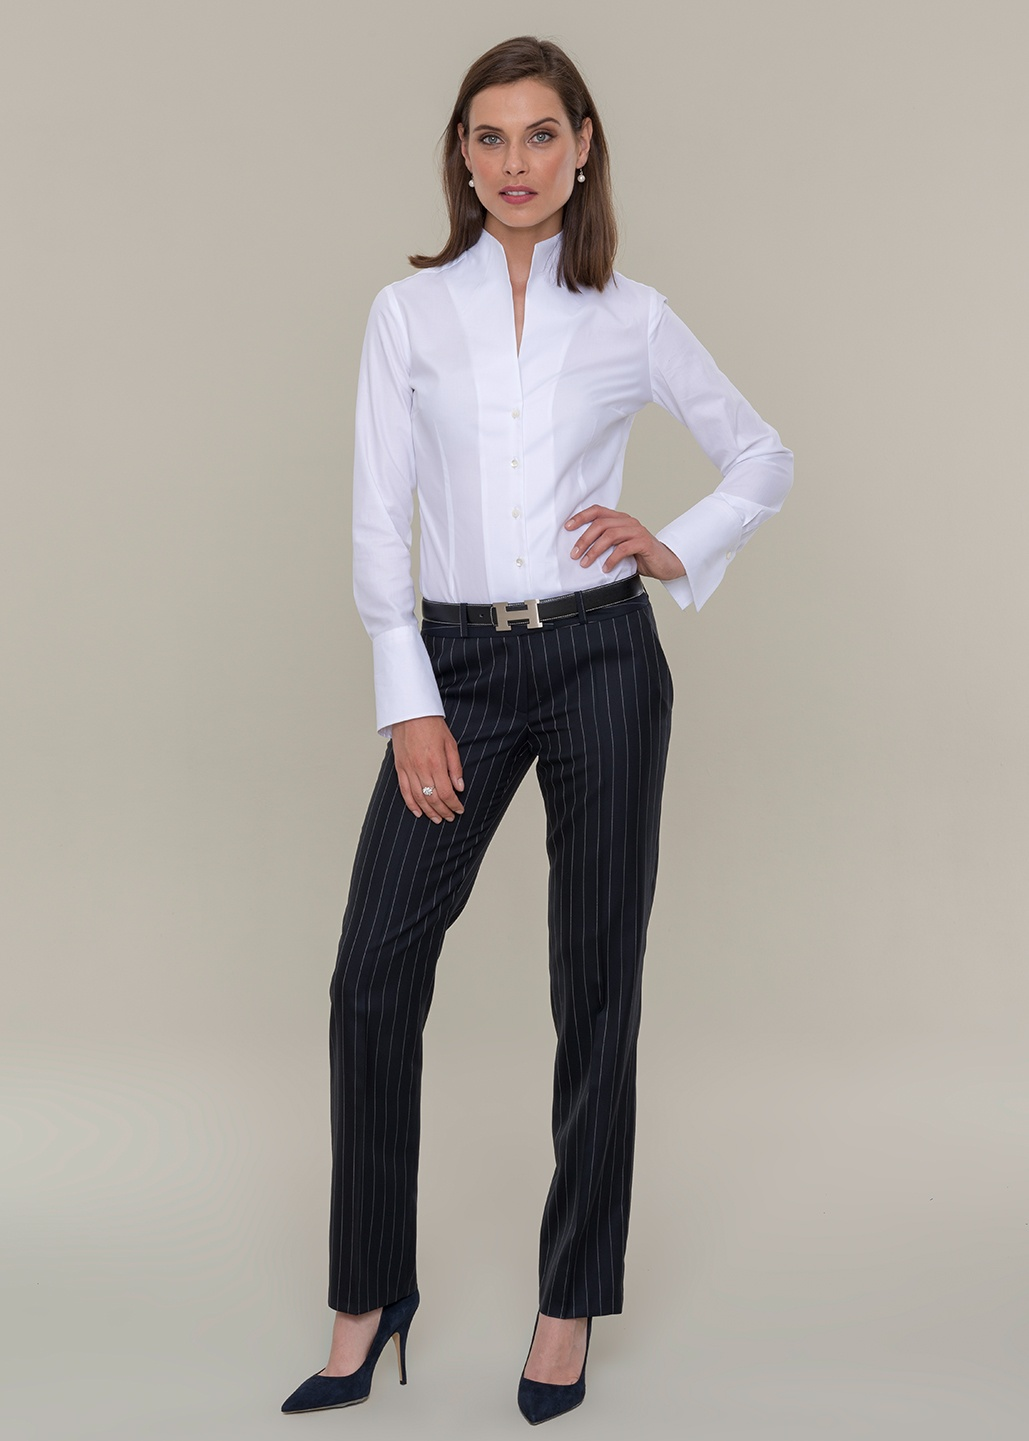 DOLZER_Business-Lady-Dresscode-Bluse-weiss-HW2017.jpg